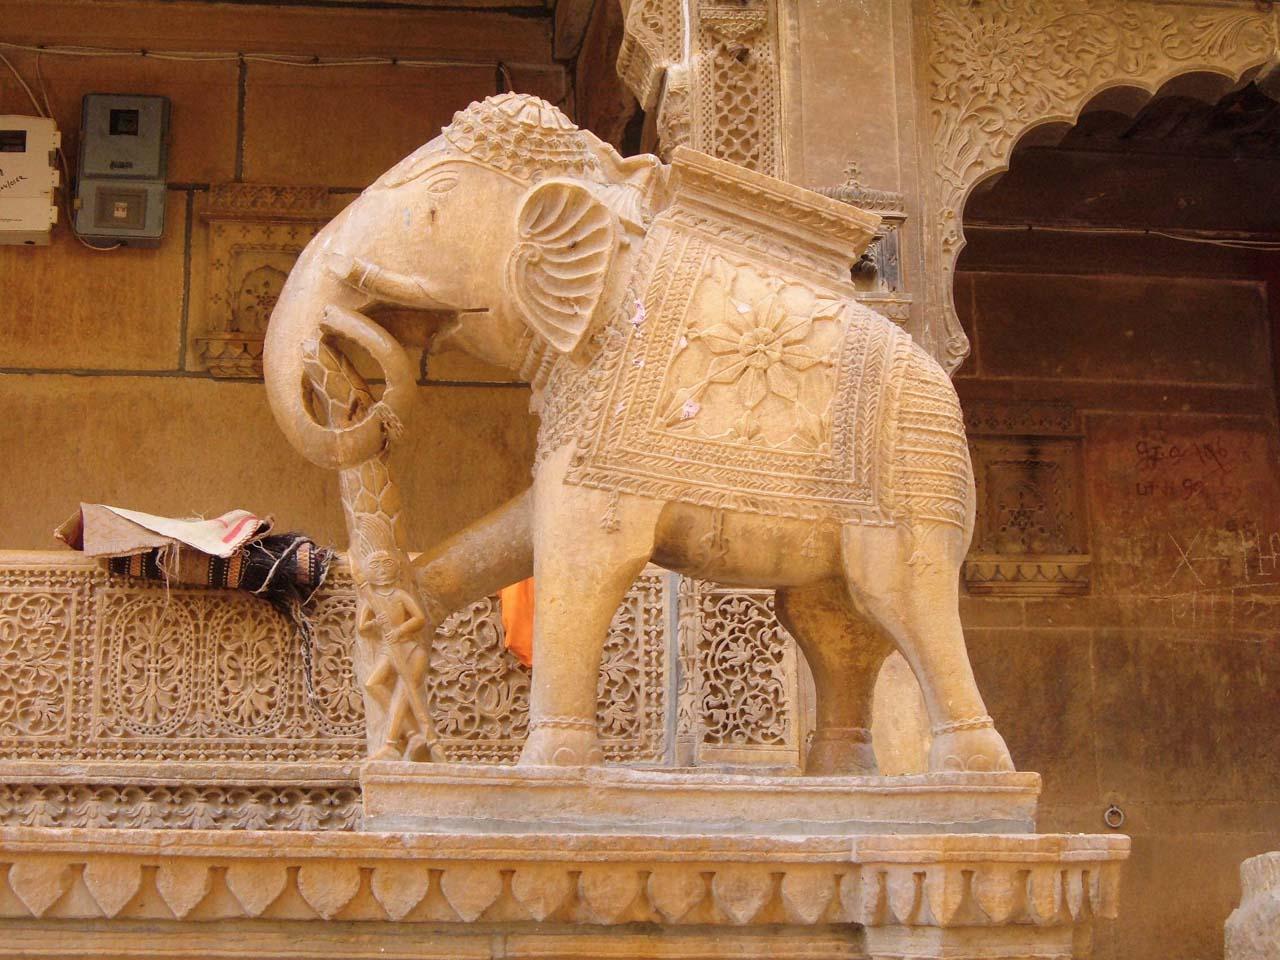 Salim singh ki Haveli - Jaisalmer's places to visit